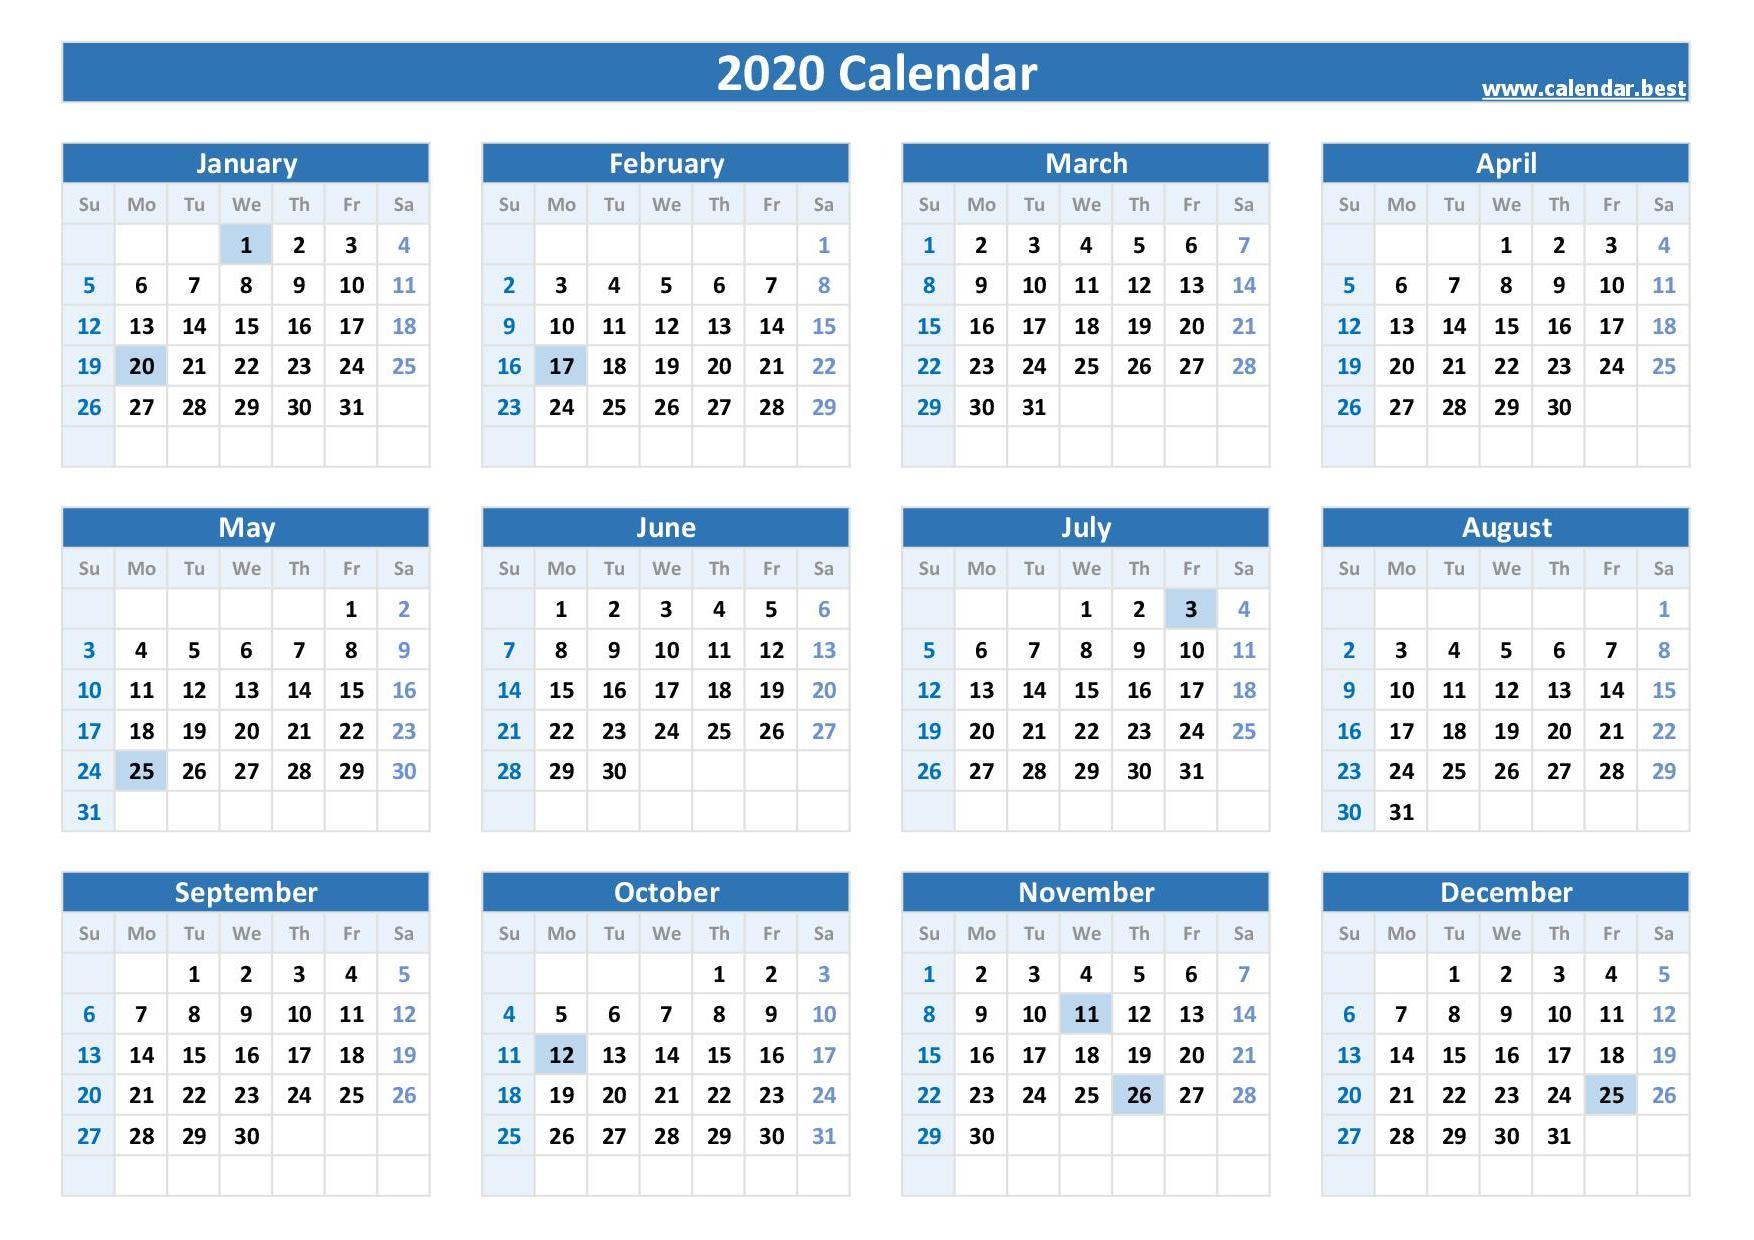 2020, 2021, 2022, 2023 Federal Holidays : List And Calendars